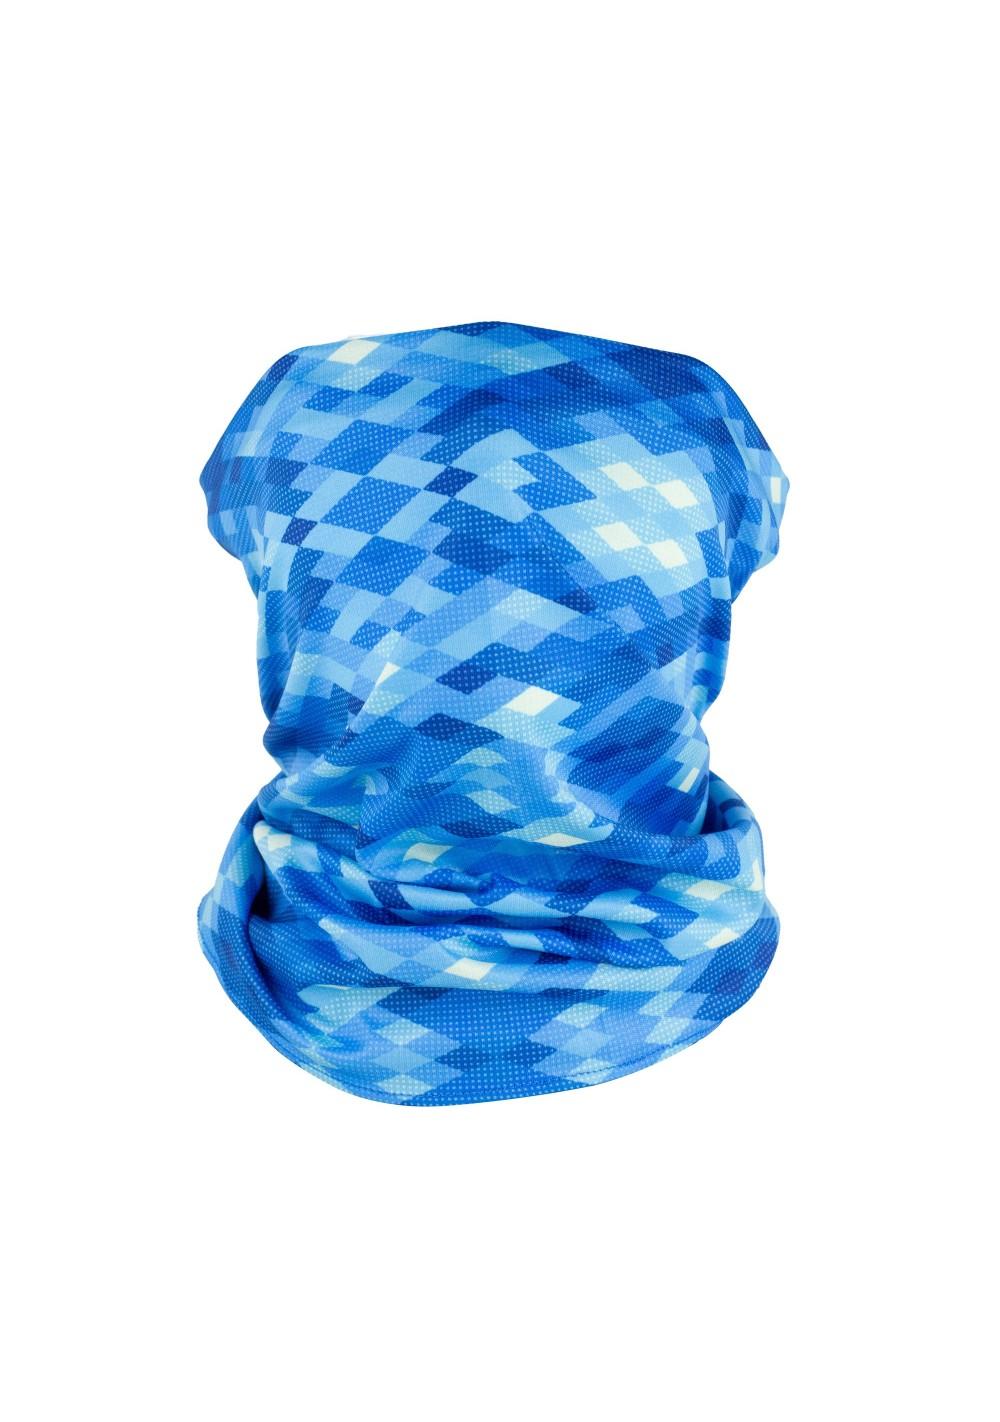 aqua blue graphic argyle print neck gaiter mask